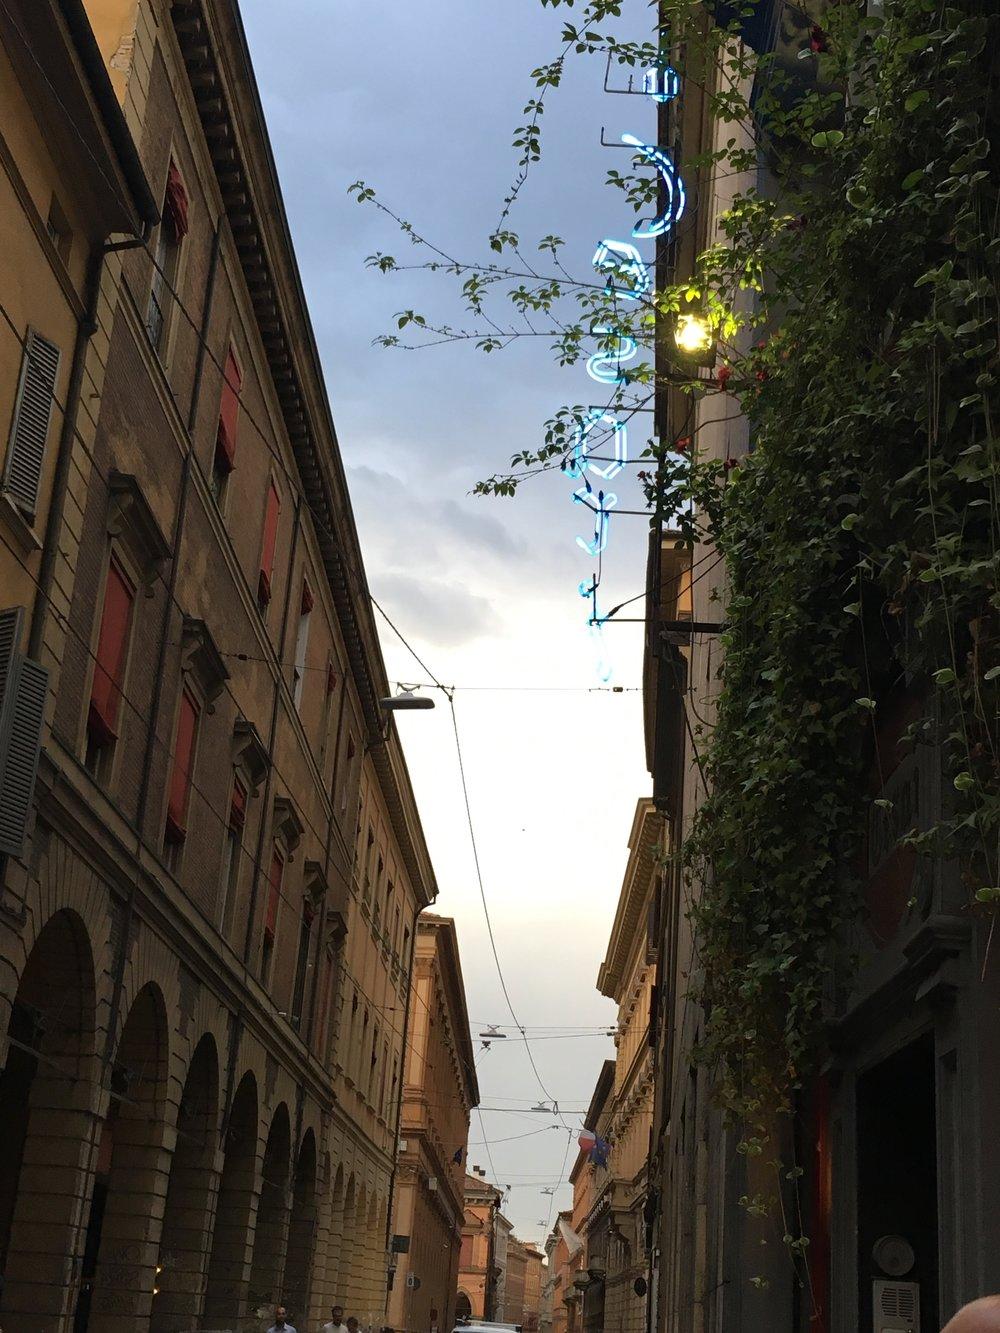 da cesari at night, bologna, Italy